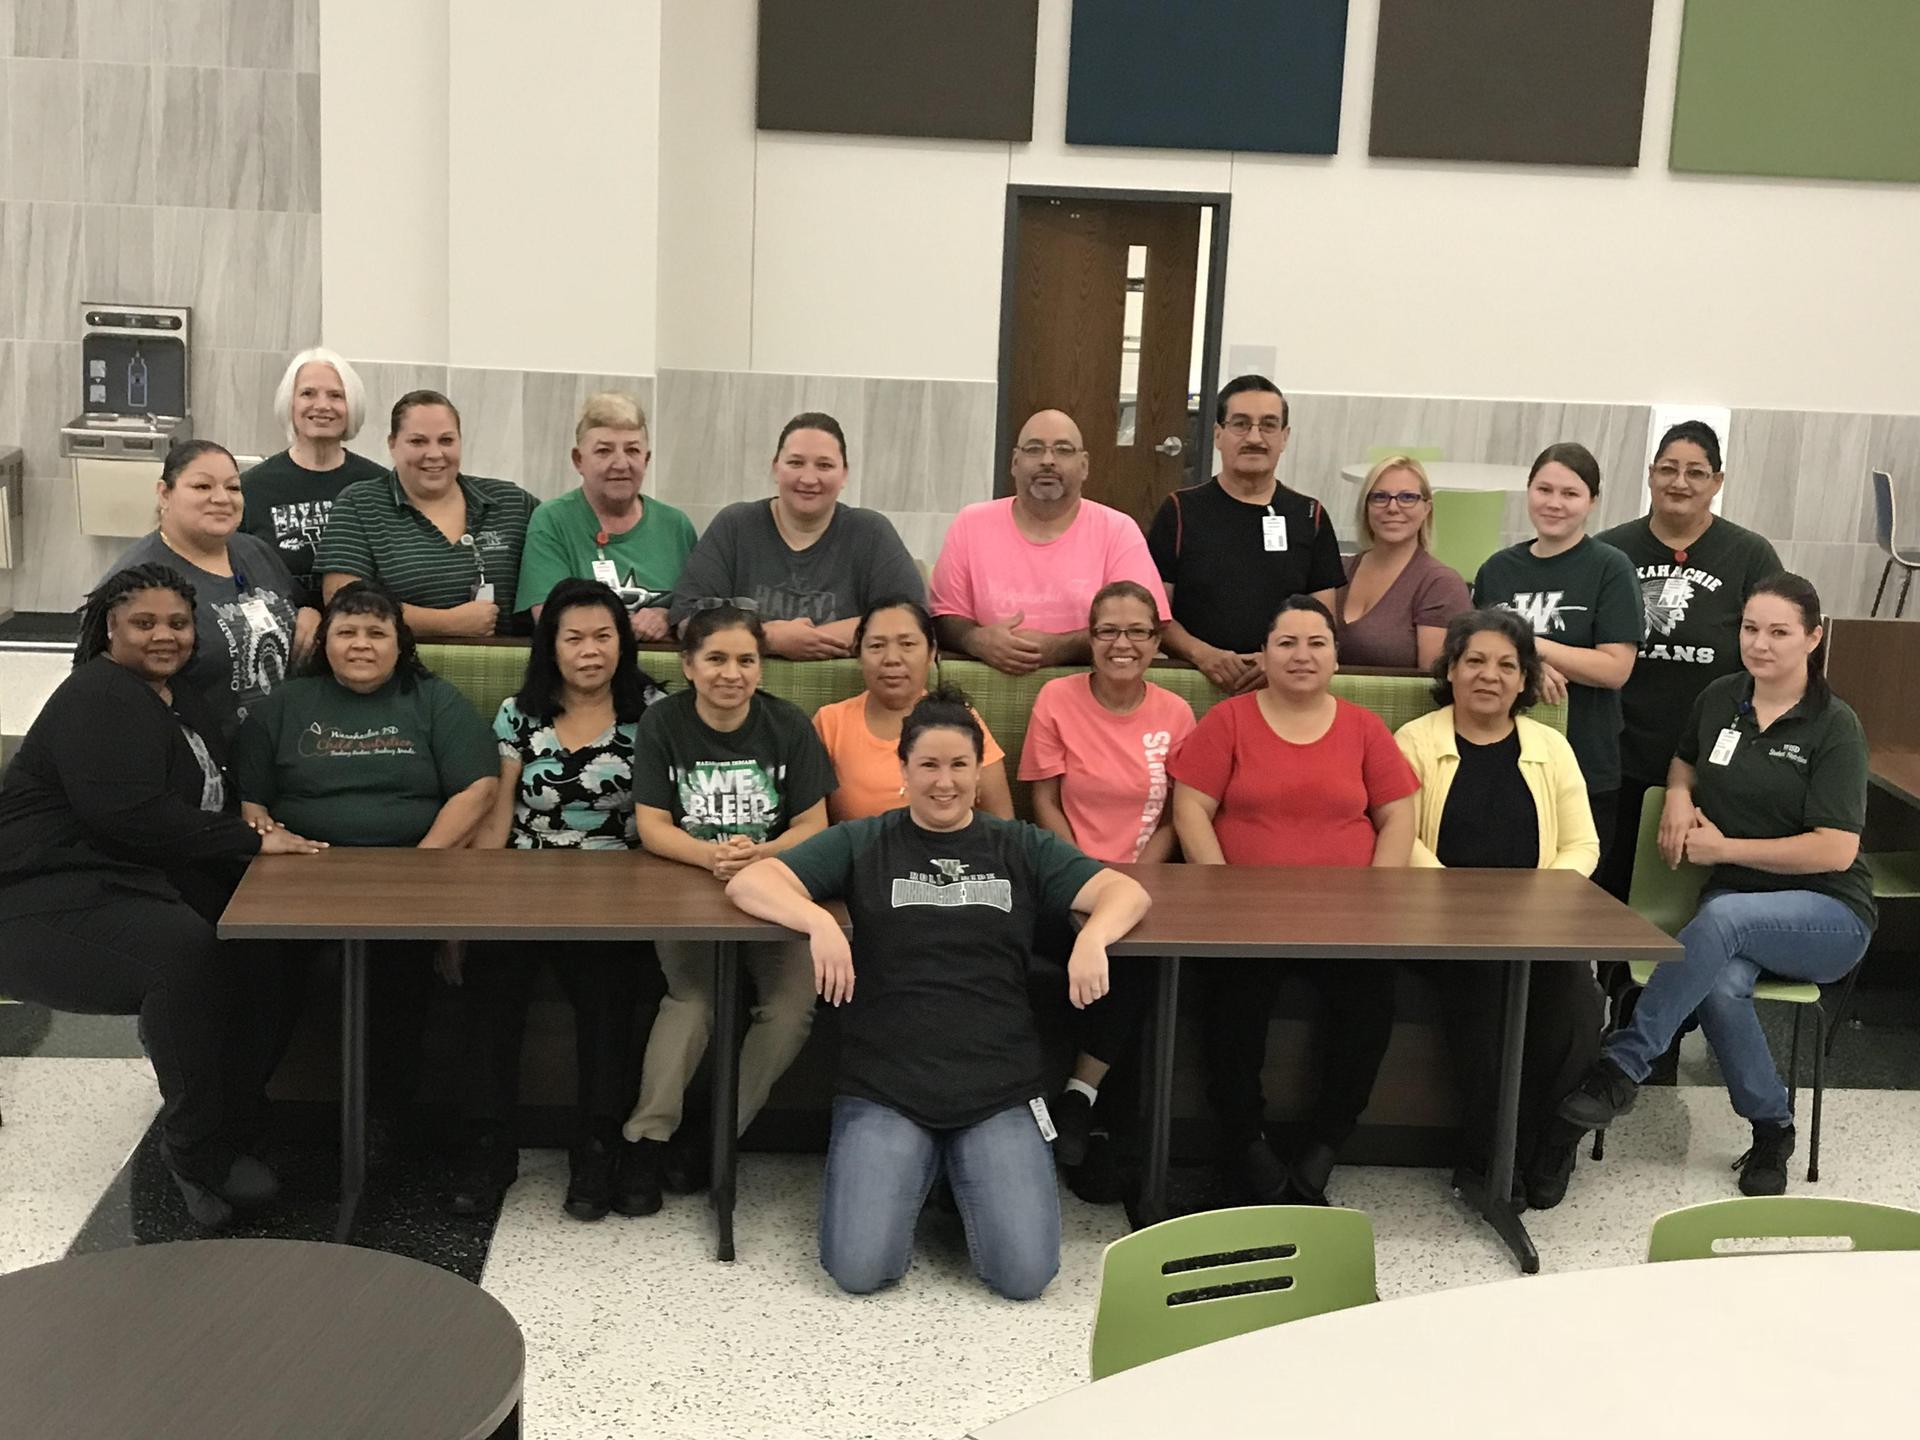 20 ladies & gentlemen of the WHS child nutrition team